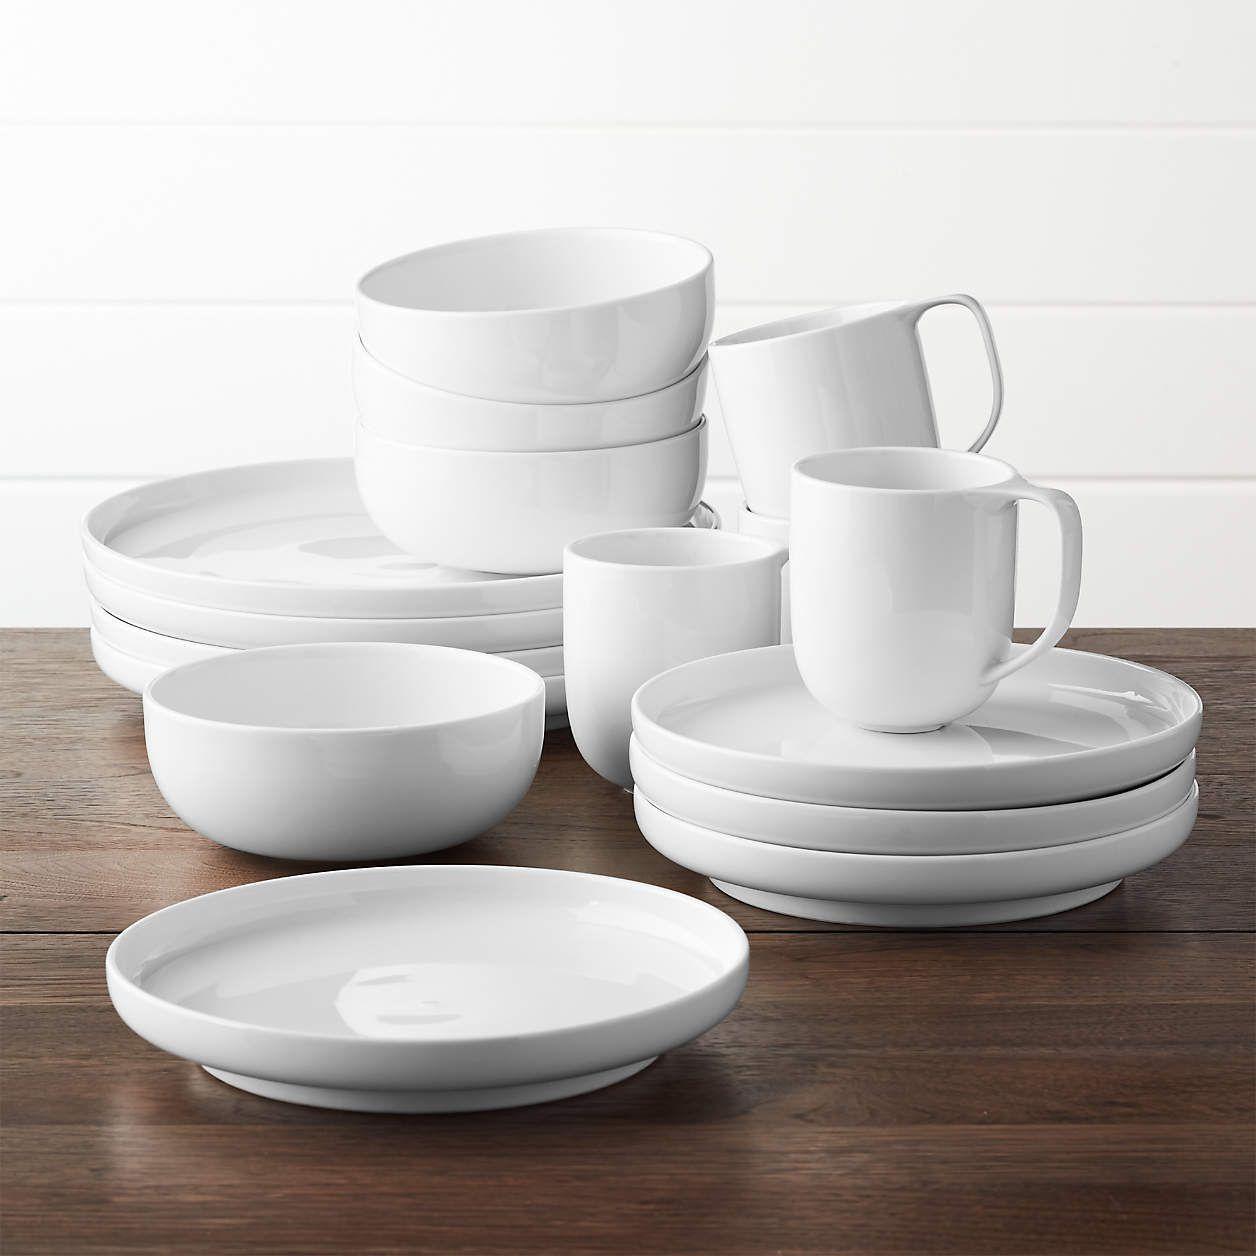 toben-dinnerware-set